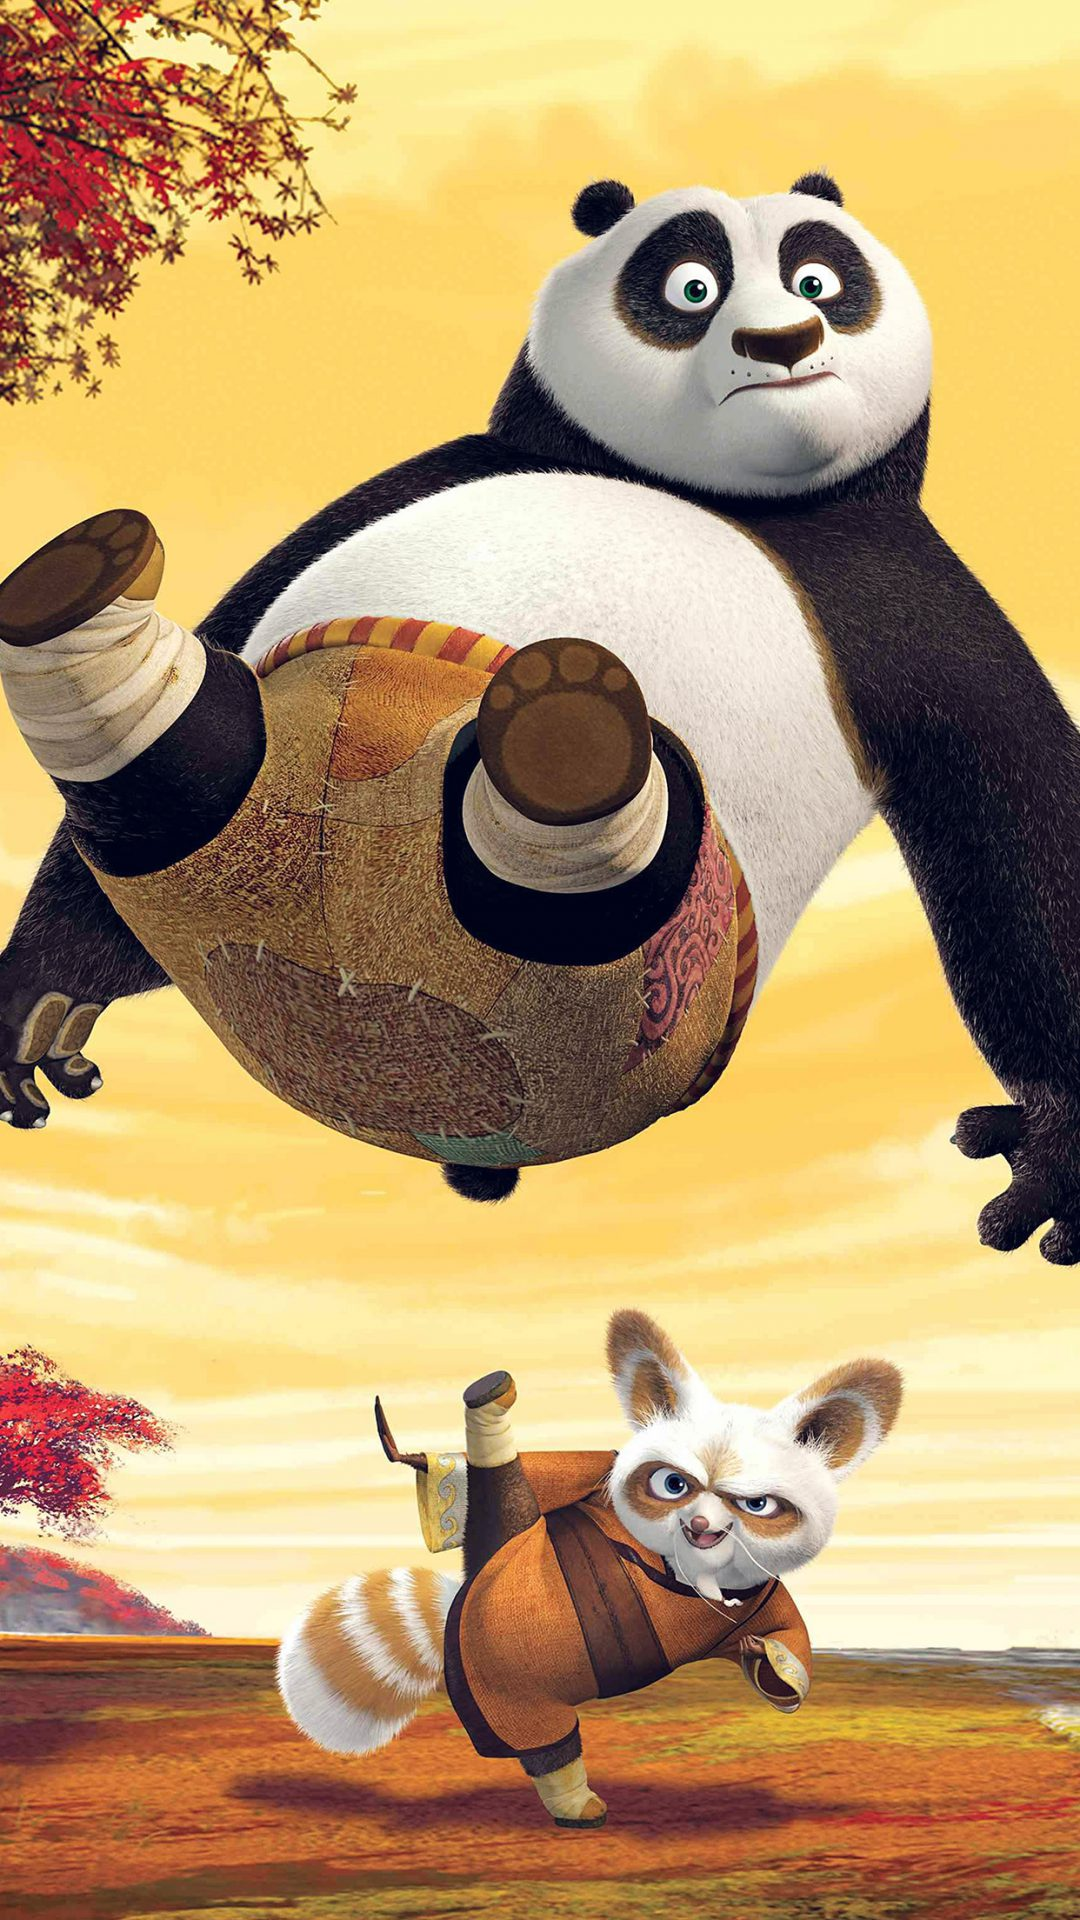 Kungfu Panda Dreamworks Art Kick Cute Anime